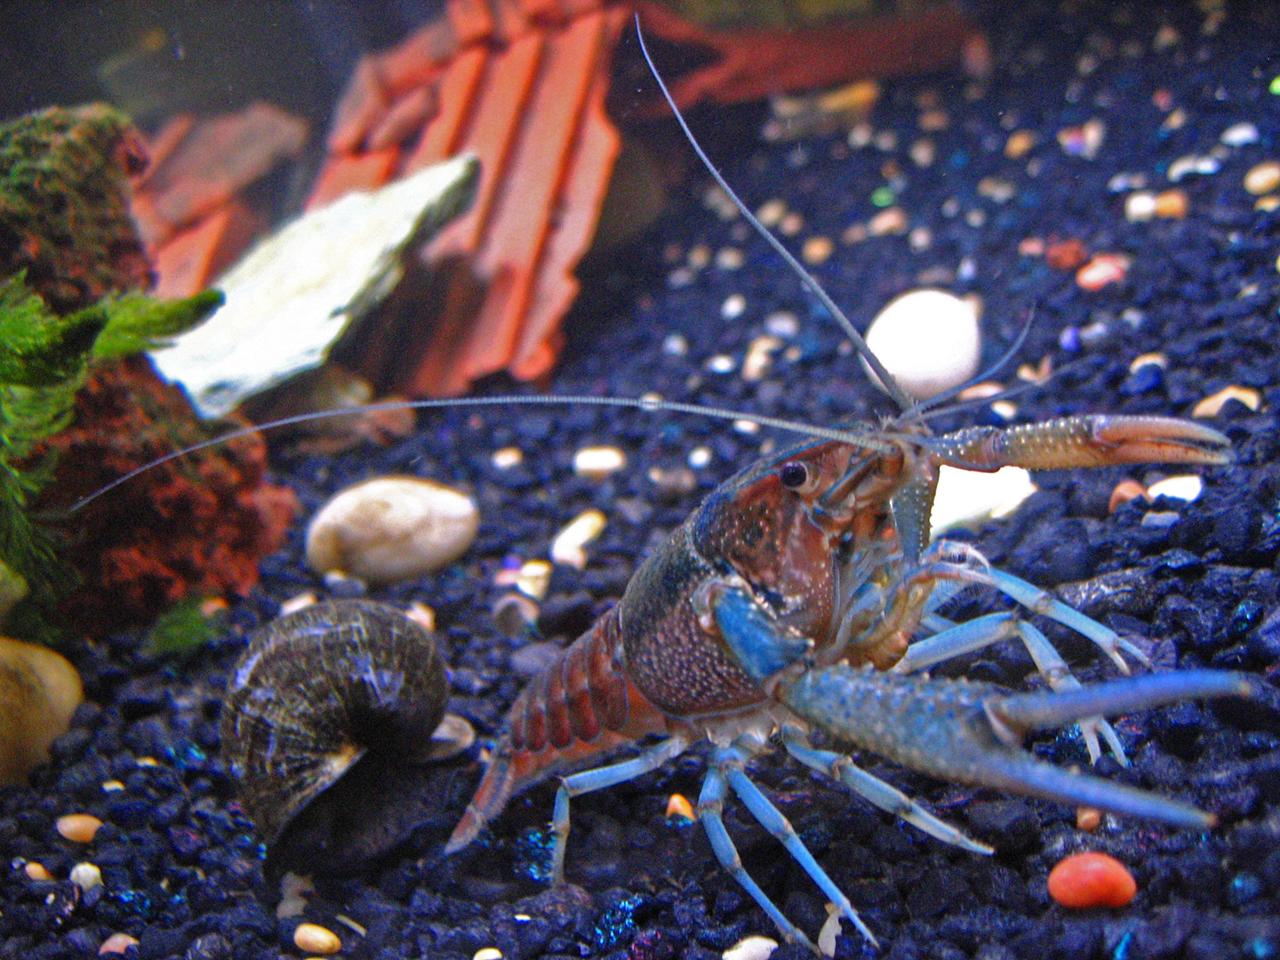 Freshwater aquarium fish that eat snails - File Pet Crayfish Clippy Ii In Freshwater